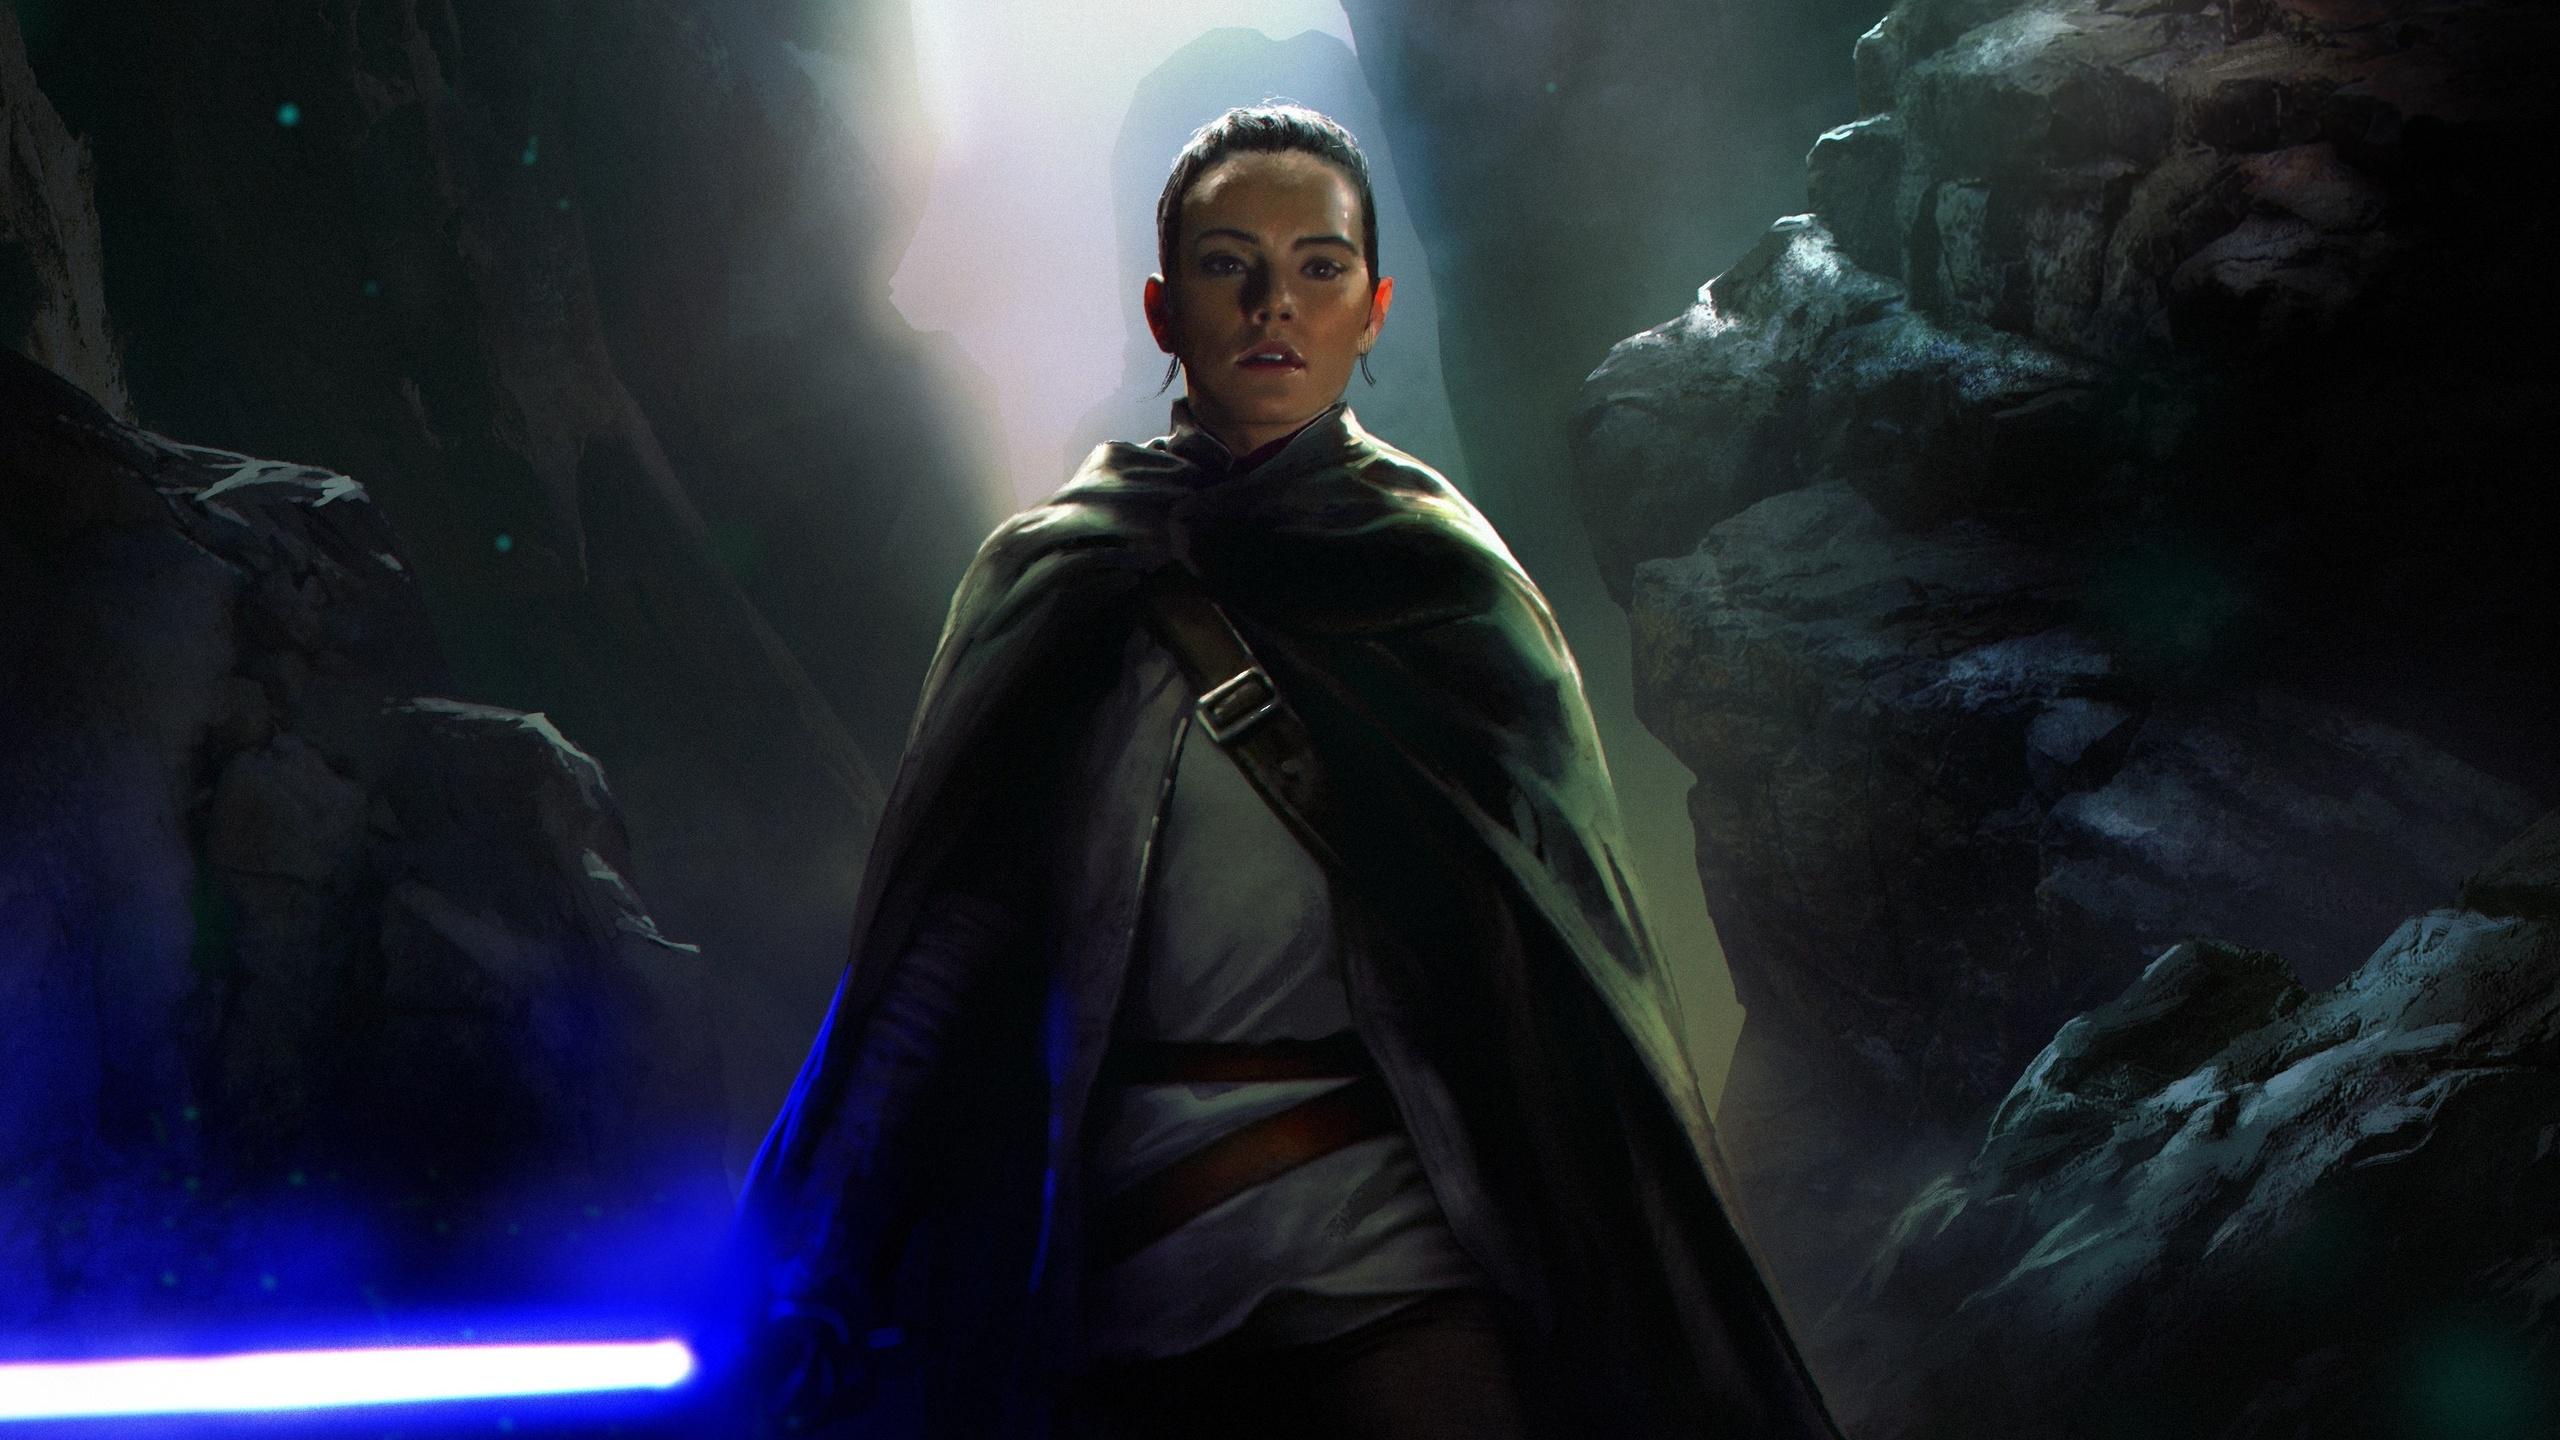 rey-star-wars-artwork-4k-fk.jpg